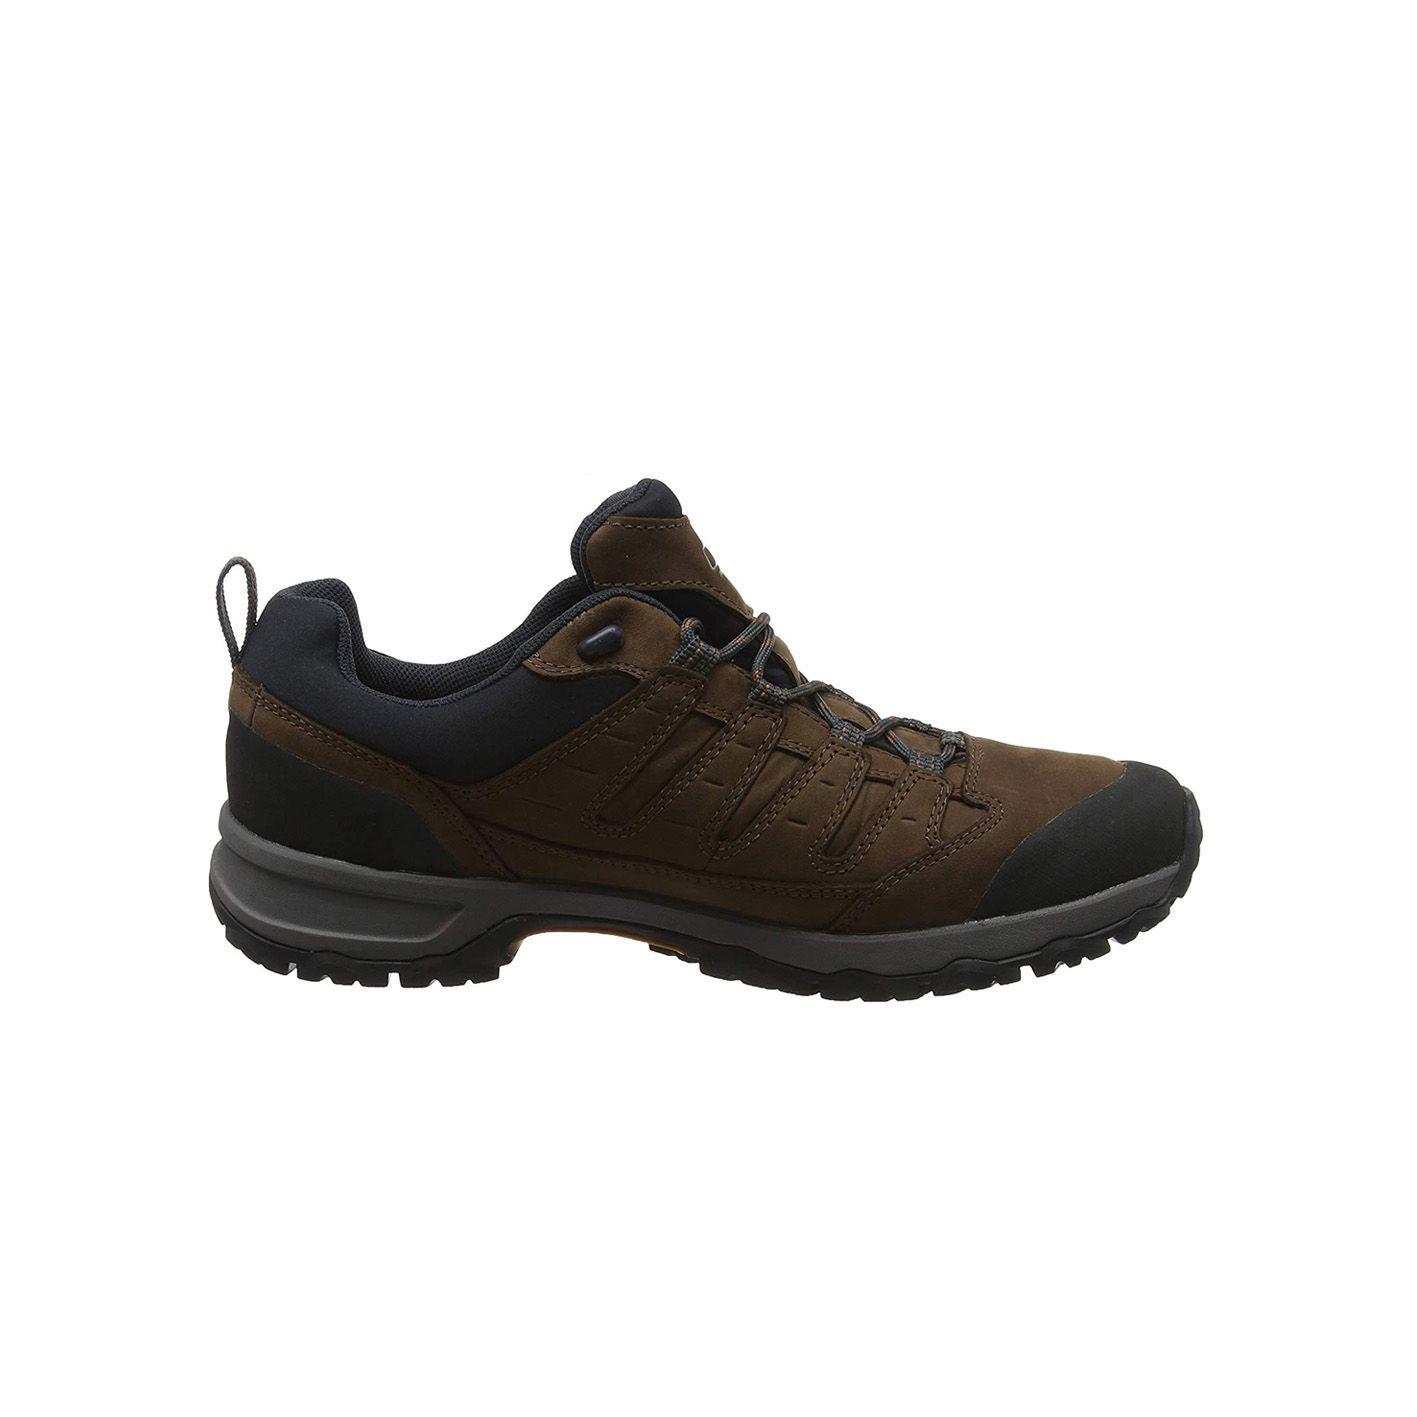 Best walking shoes 2020: Men and women